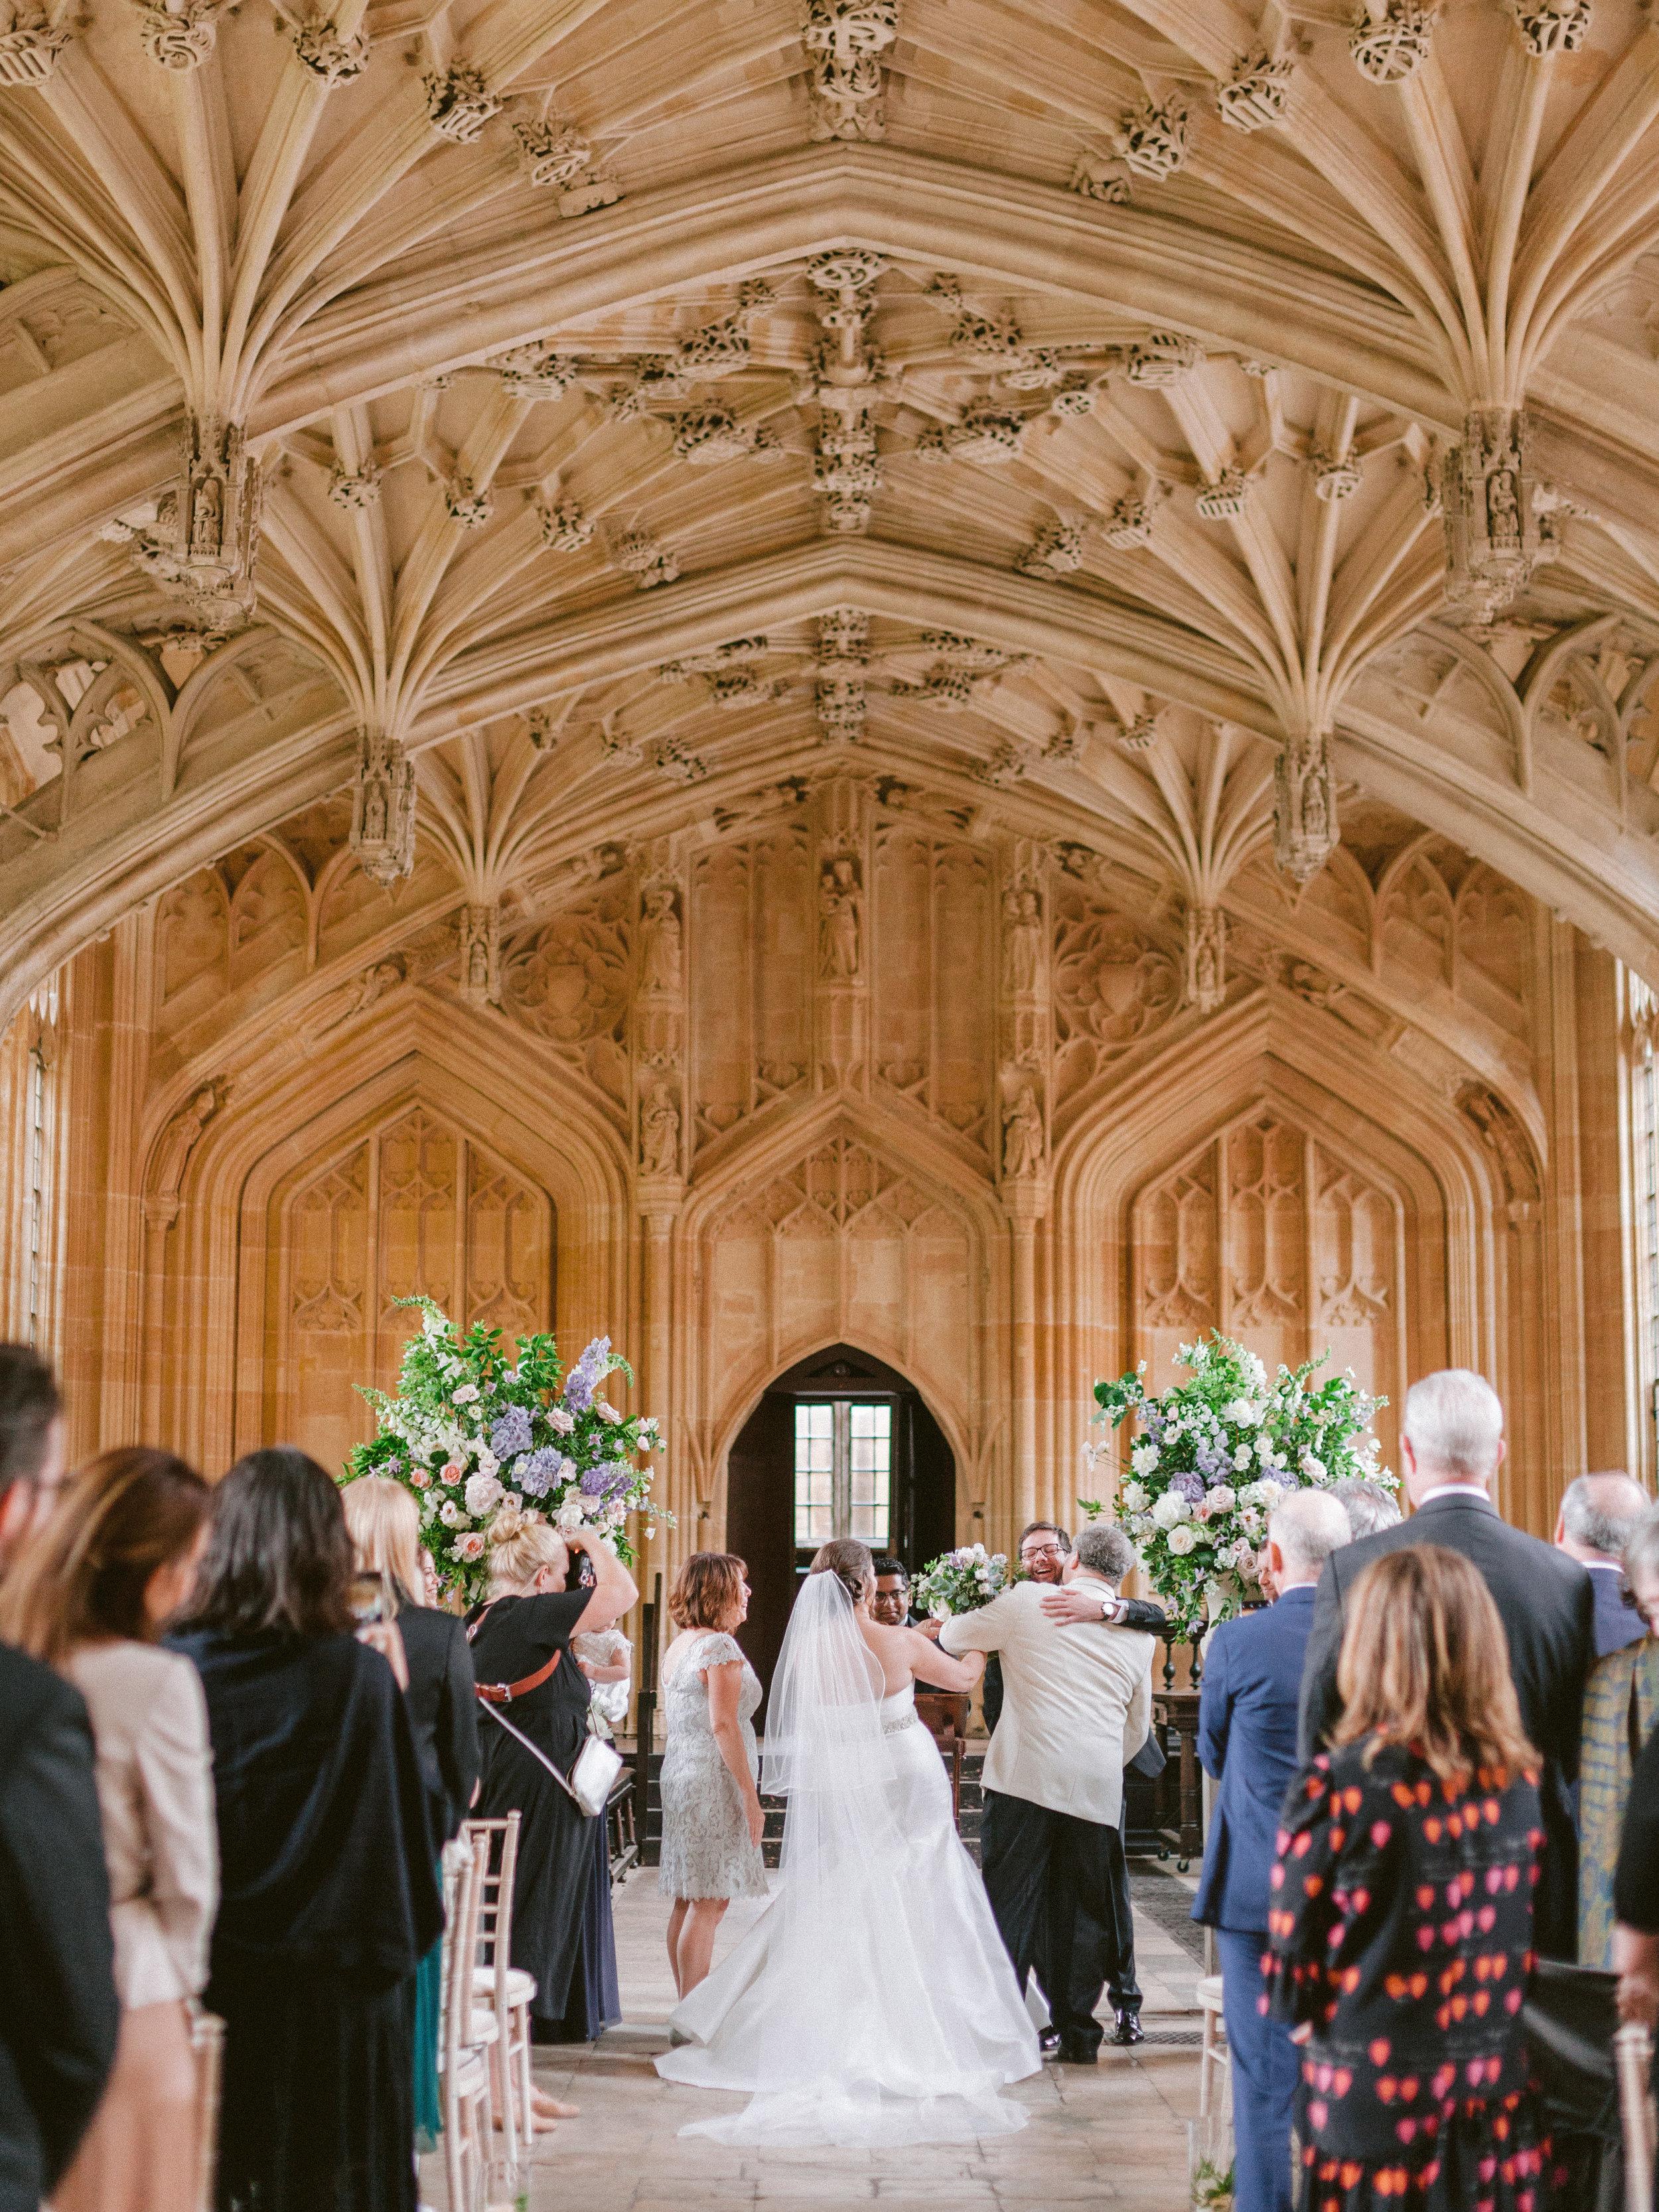 Bodleian Library Blenheim Palace Wedding Planner Vanilla Rose Weddings